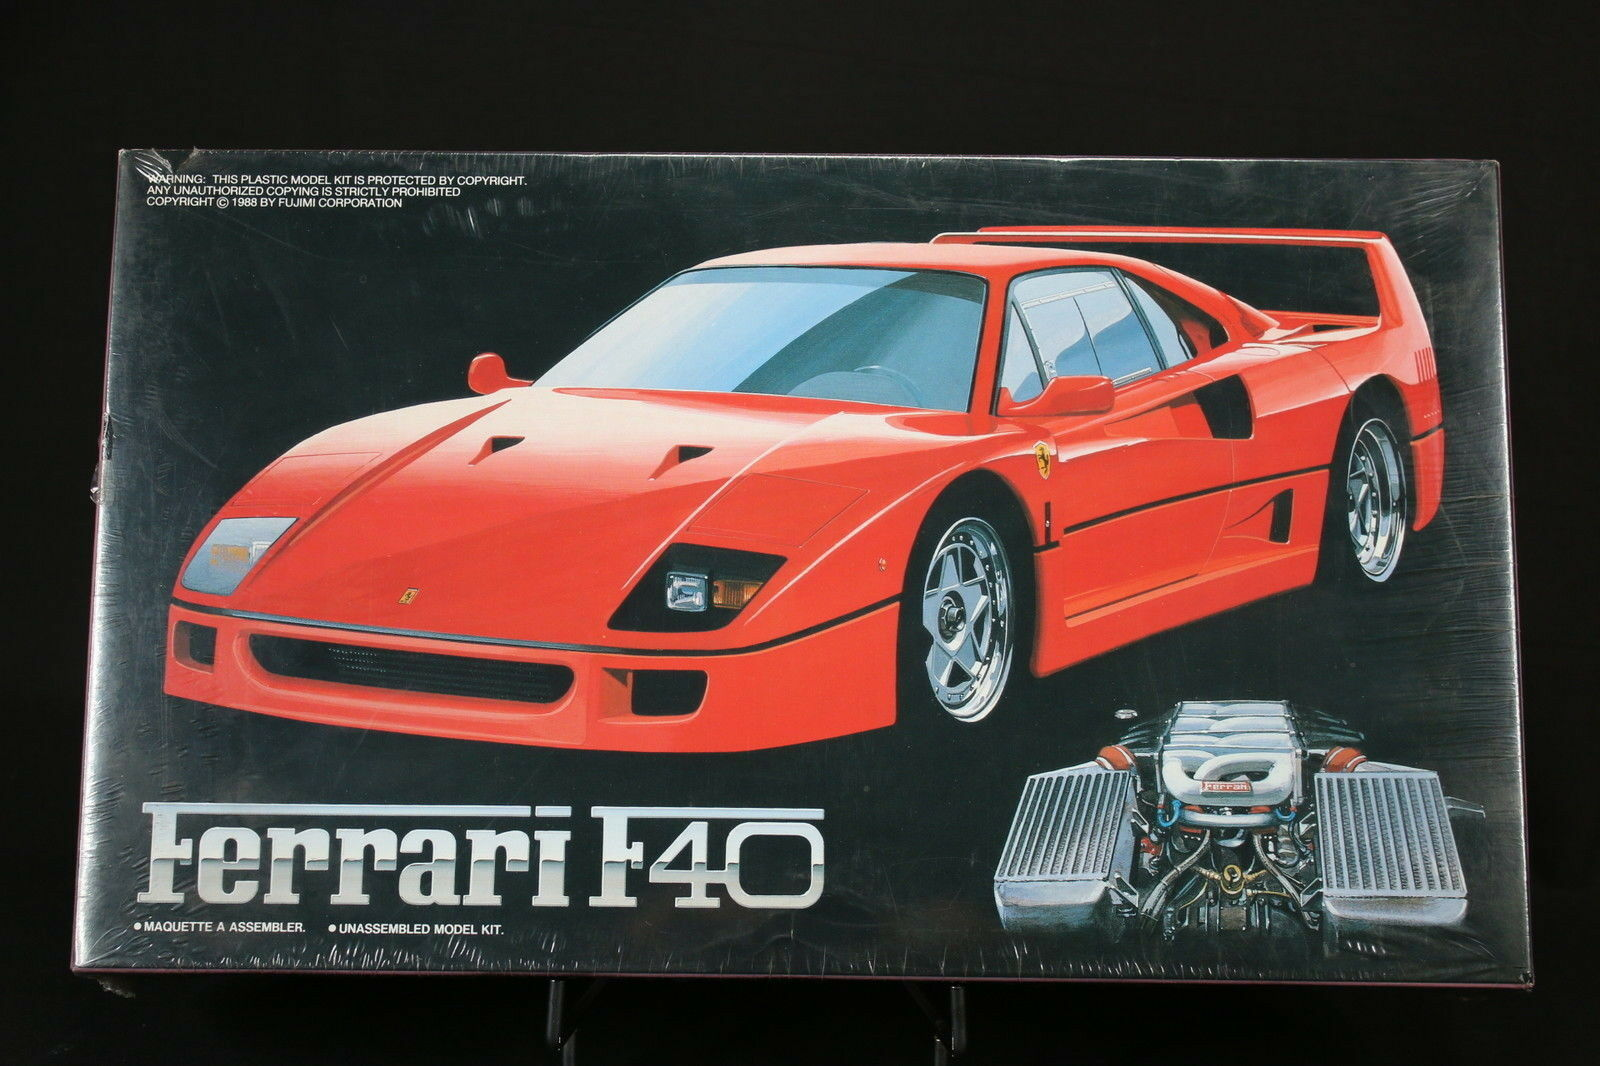 XA041 FUJIMI 1 24 maquette voiture 12001 1000 1 Ferrari F40 sports car 1988